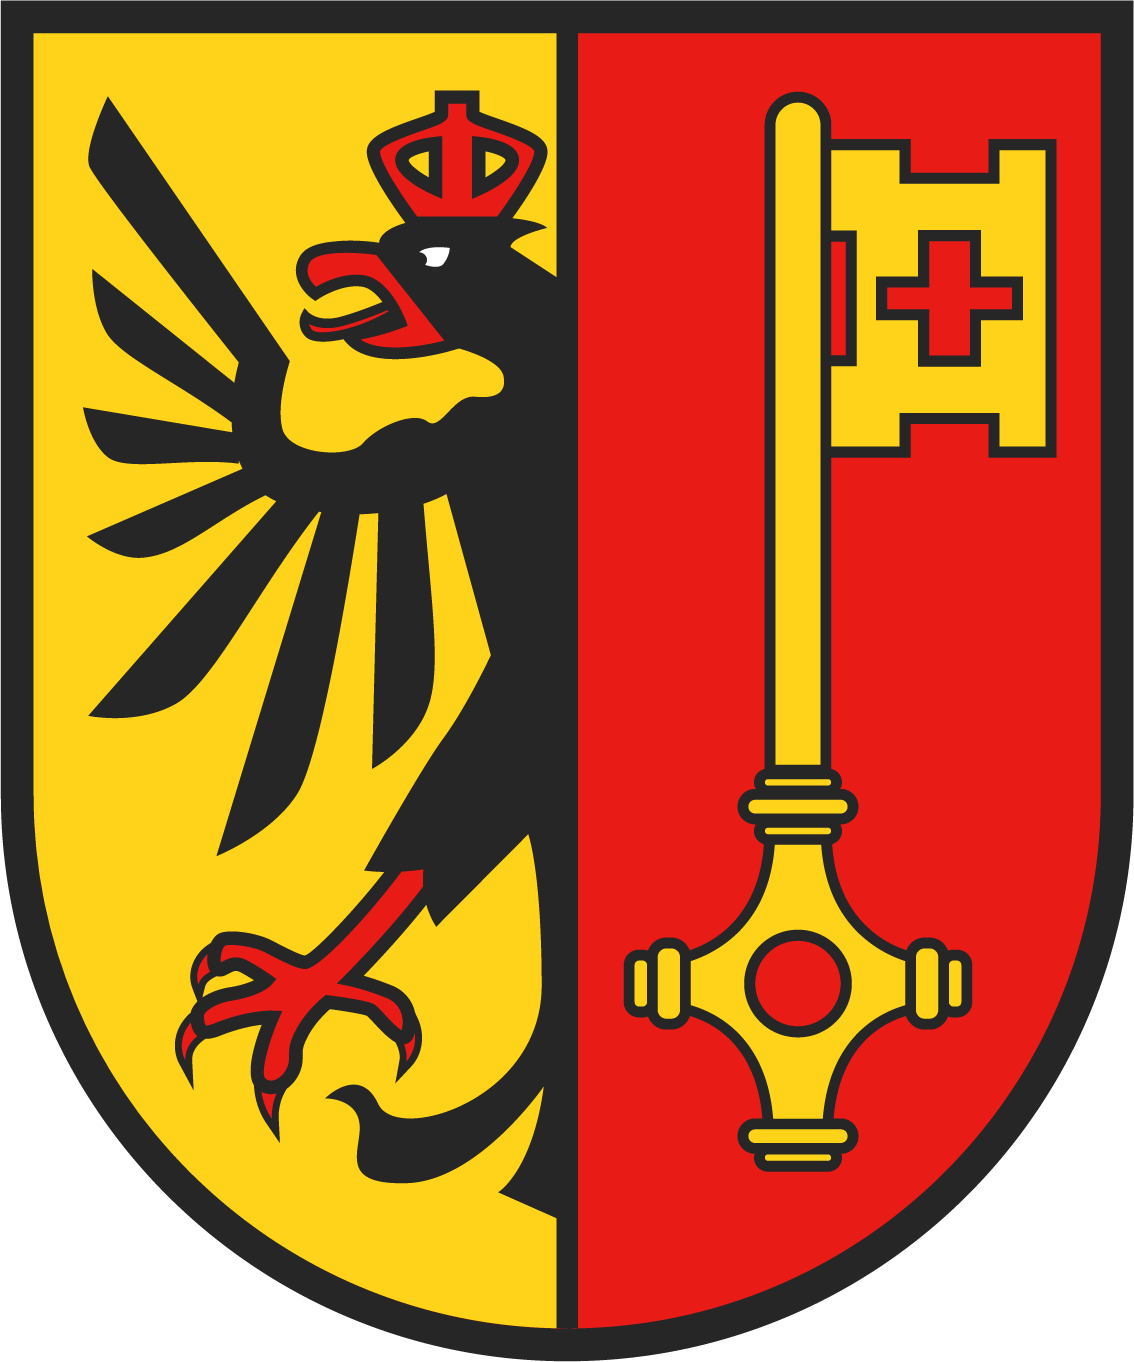 Wappen des Kantons Genf